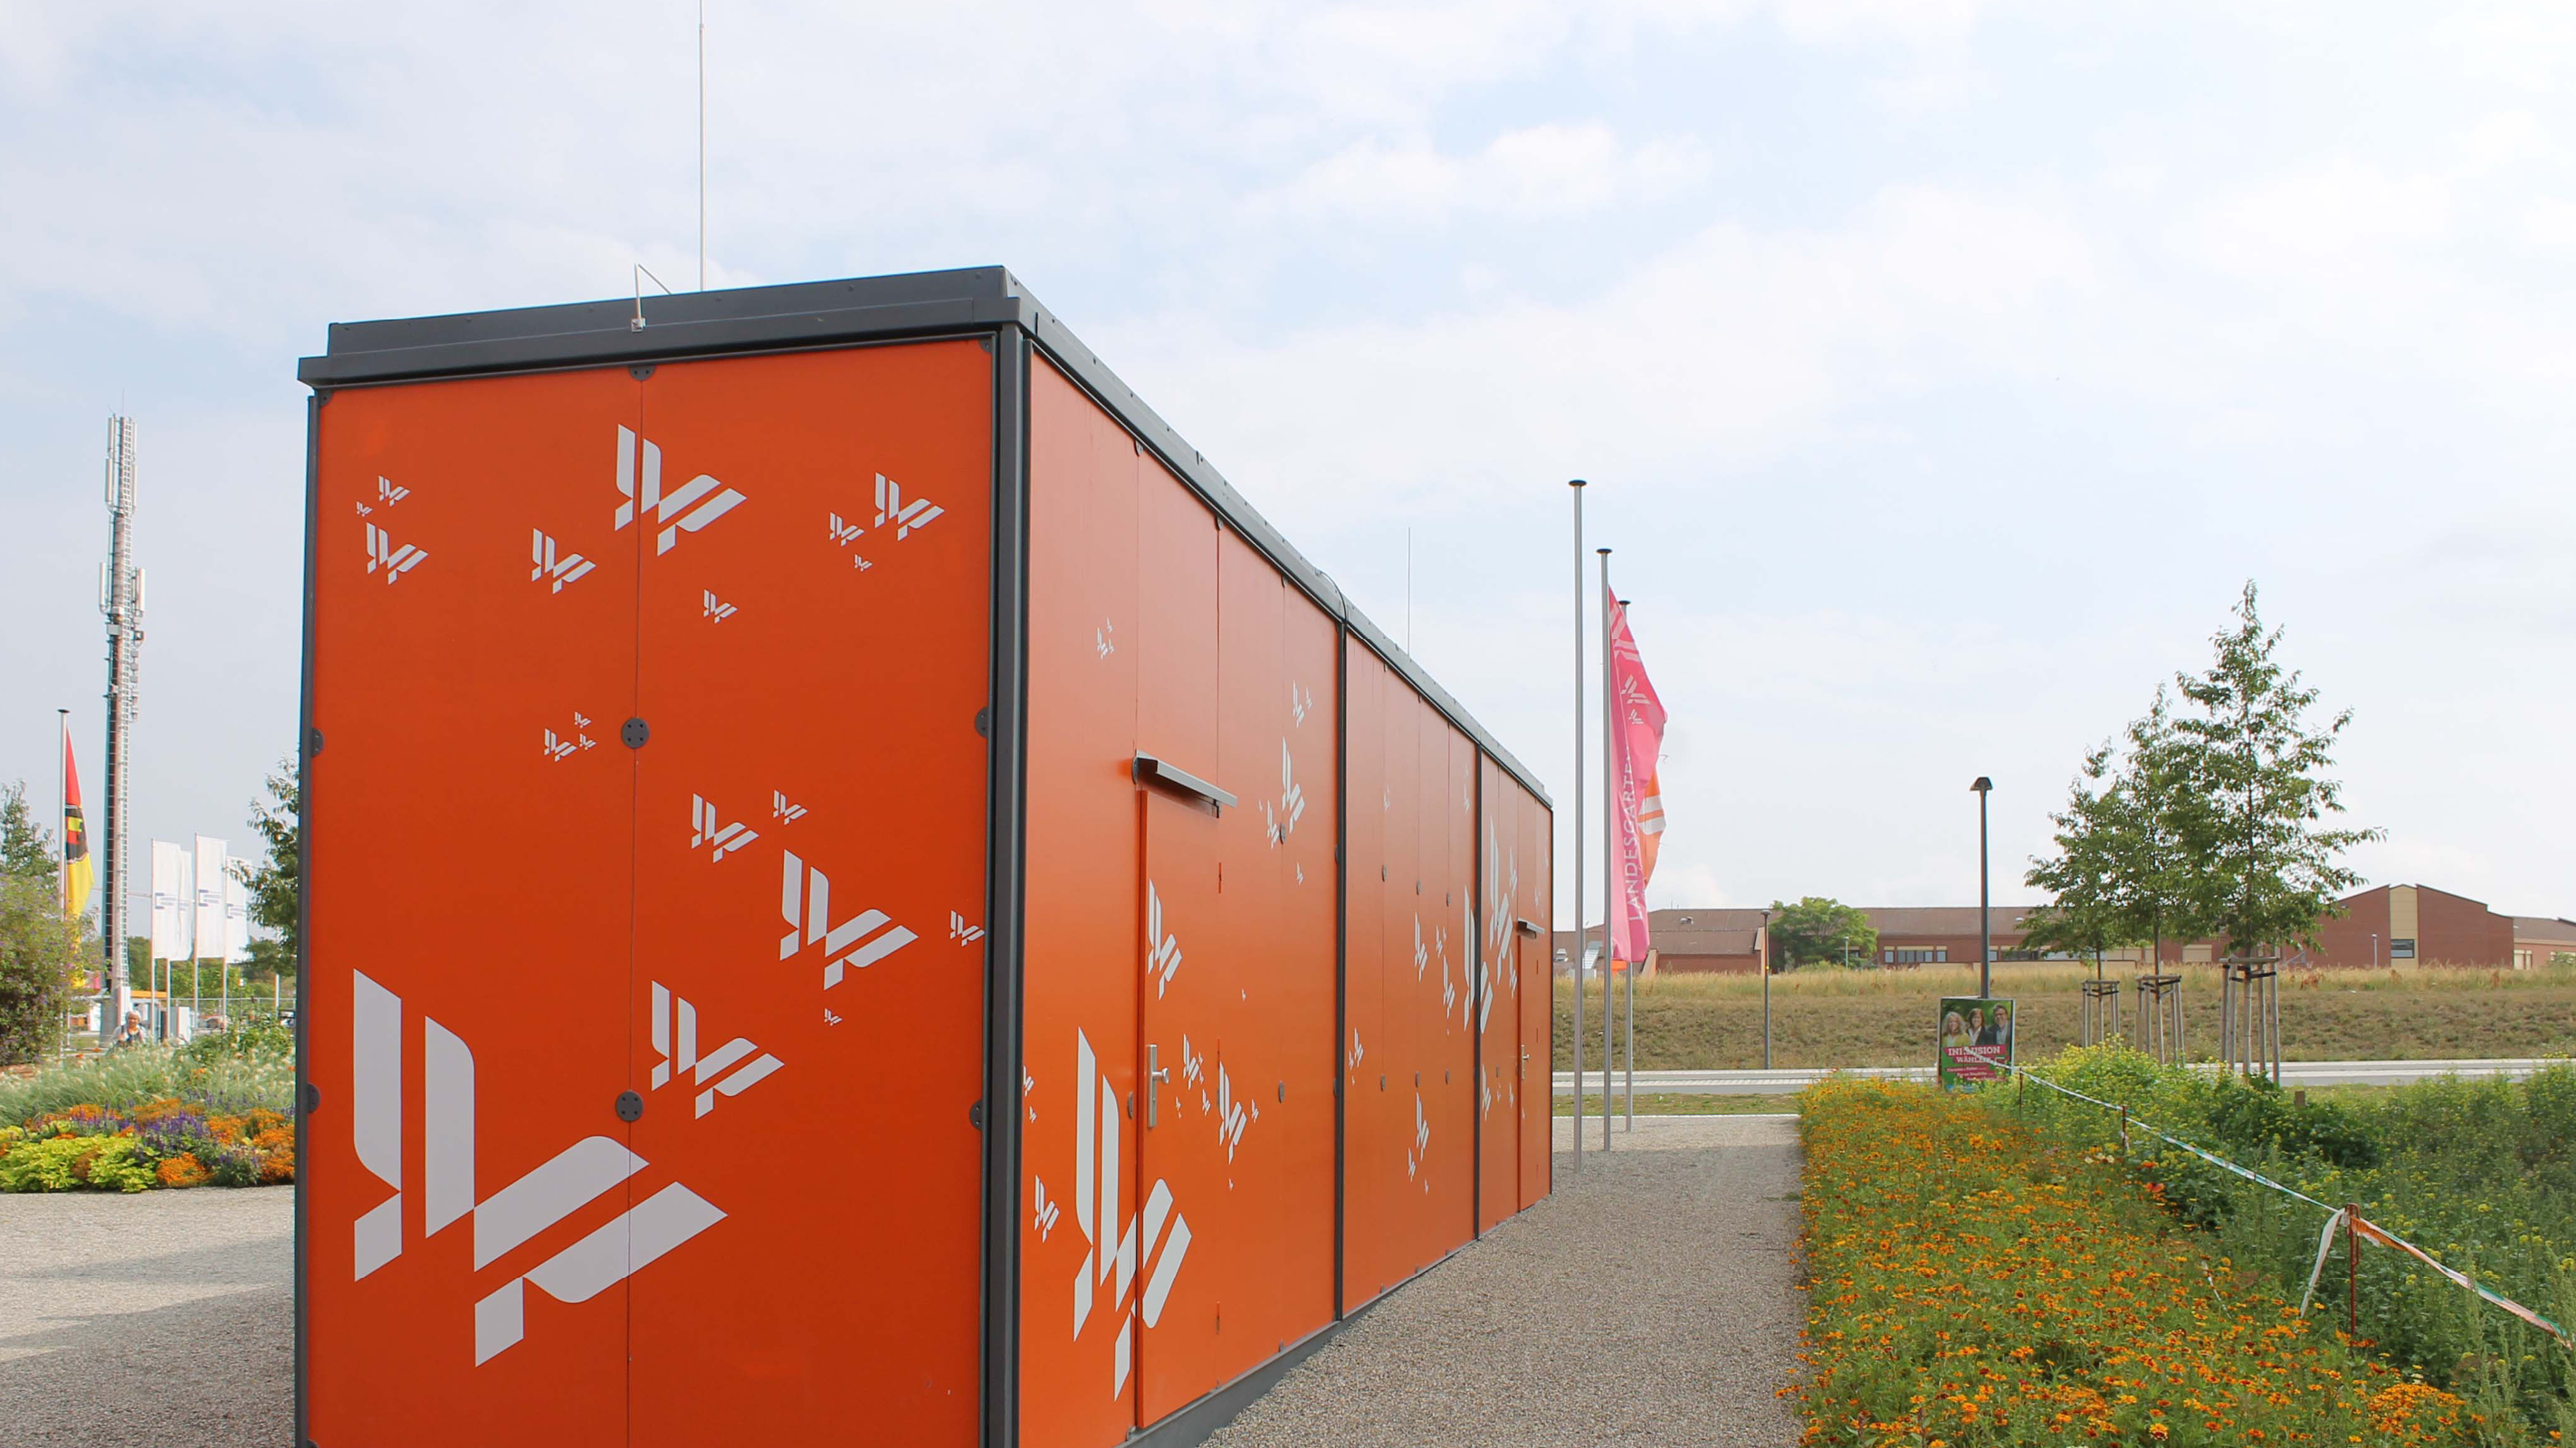 LGS Wuerzburg 2018 Signage – Poarangan Brand Design12